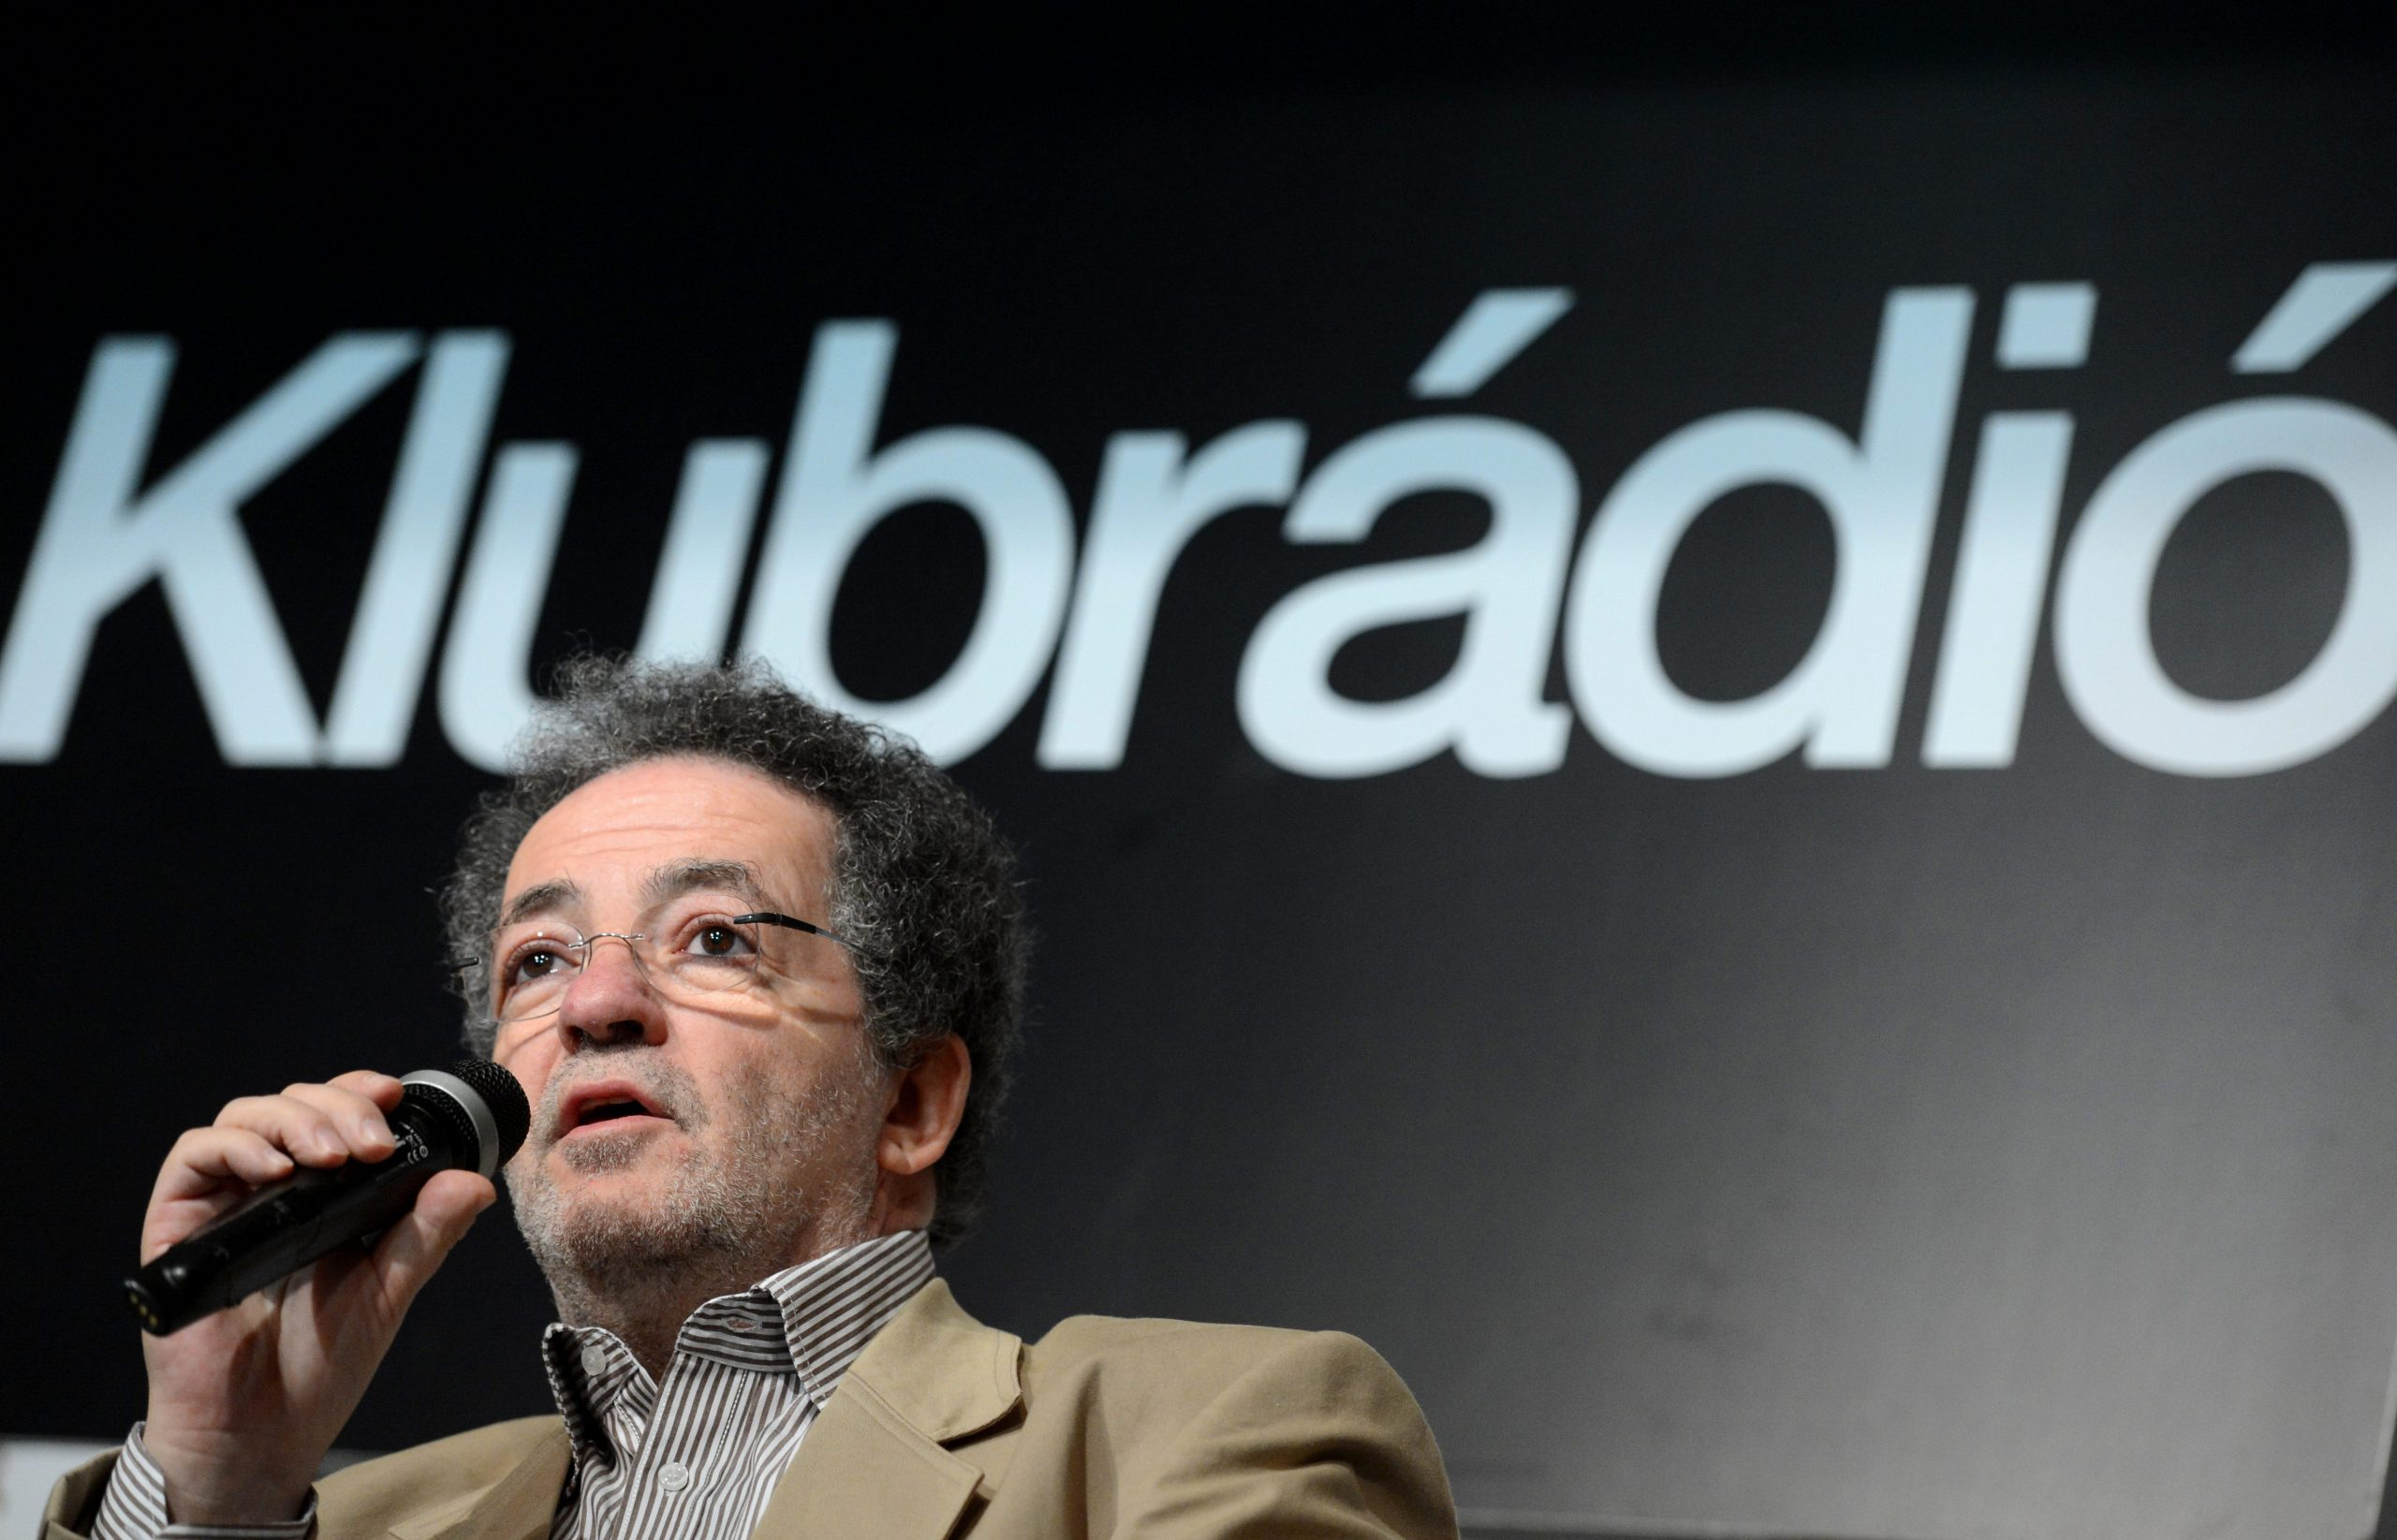 Media Authority Denies Gov't-Critical Klubrádió's Bid